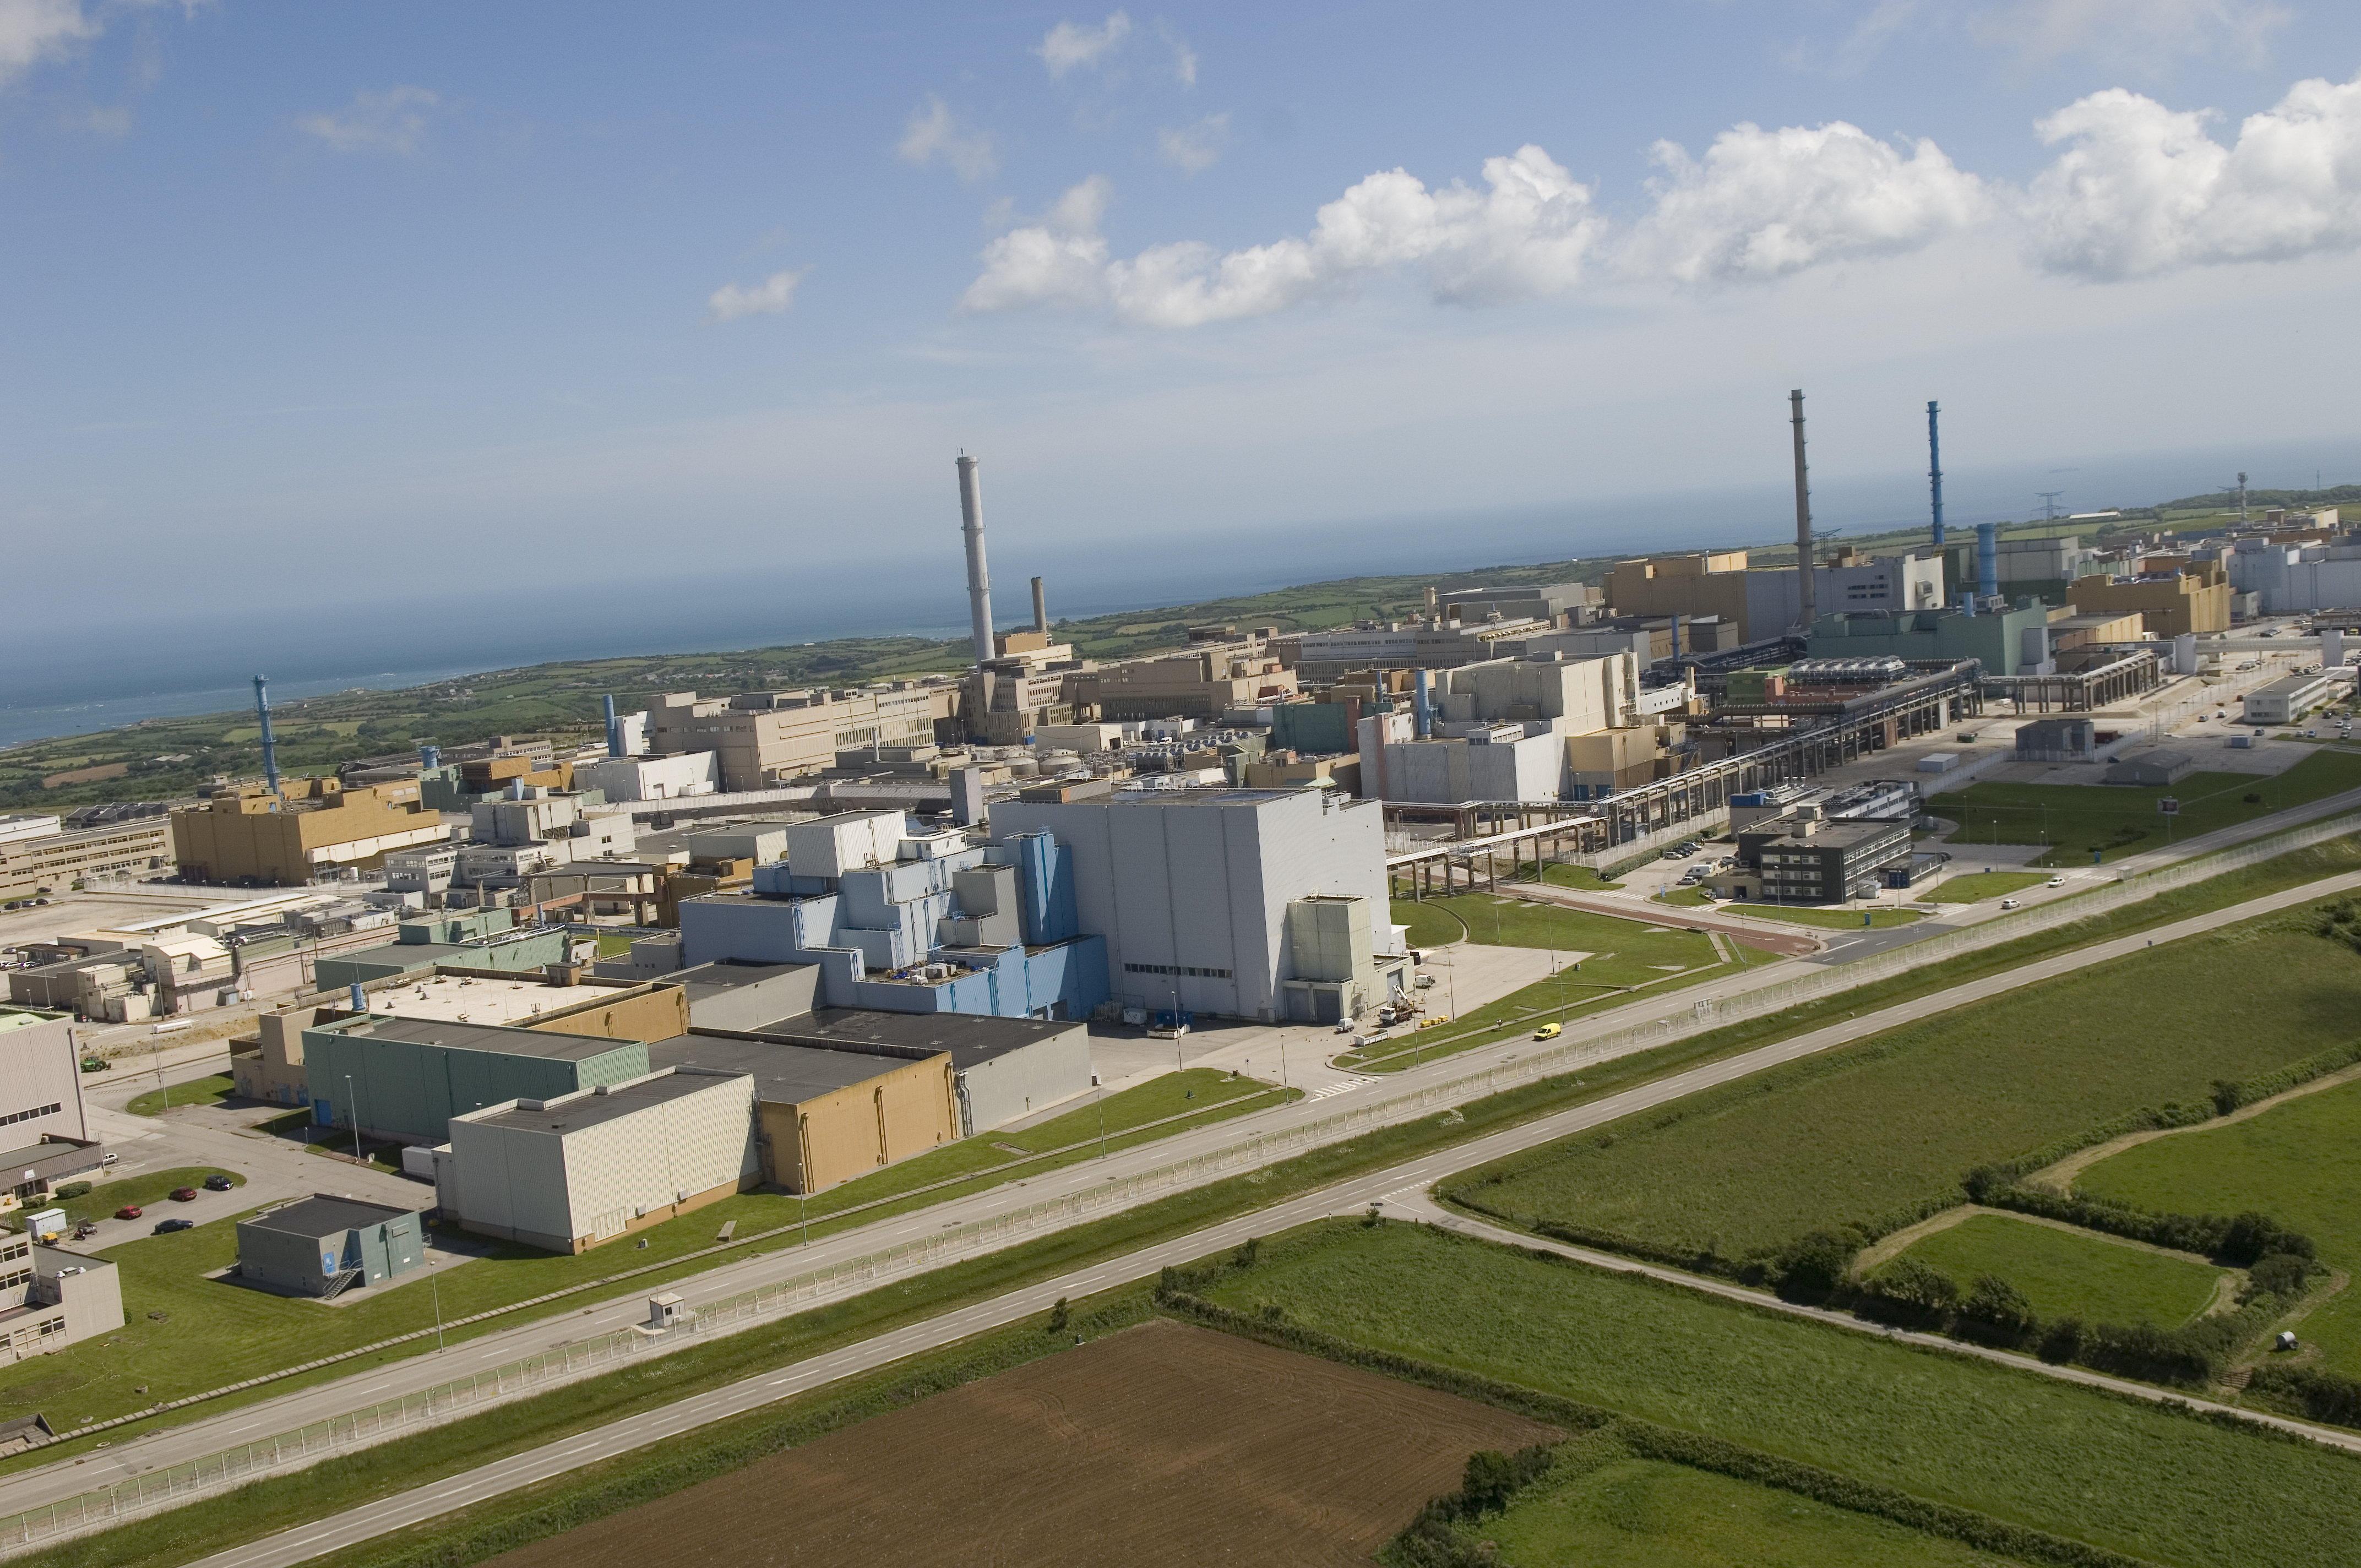 File:AREVA usine de retraitement de La Hague.jpg